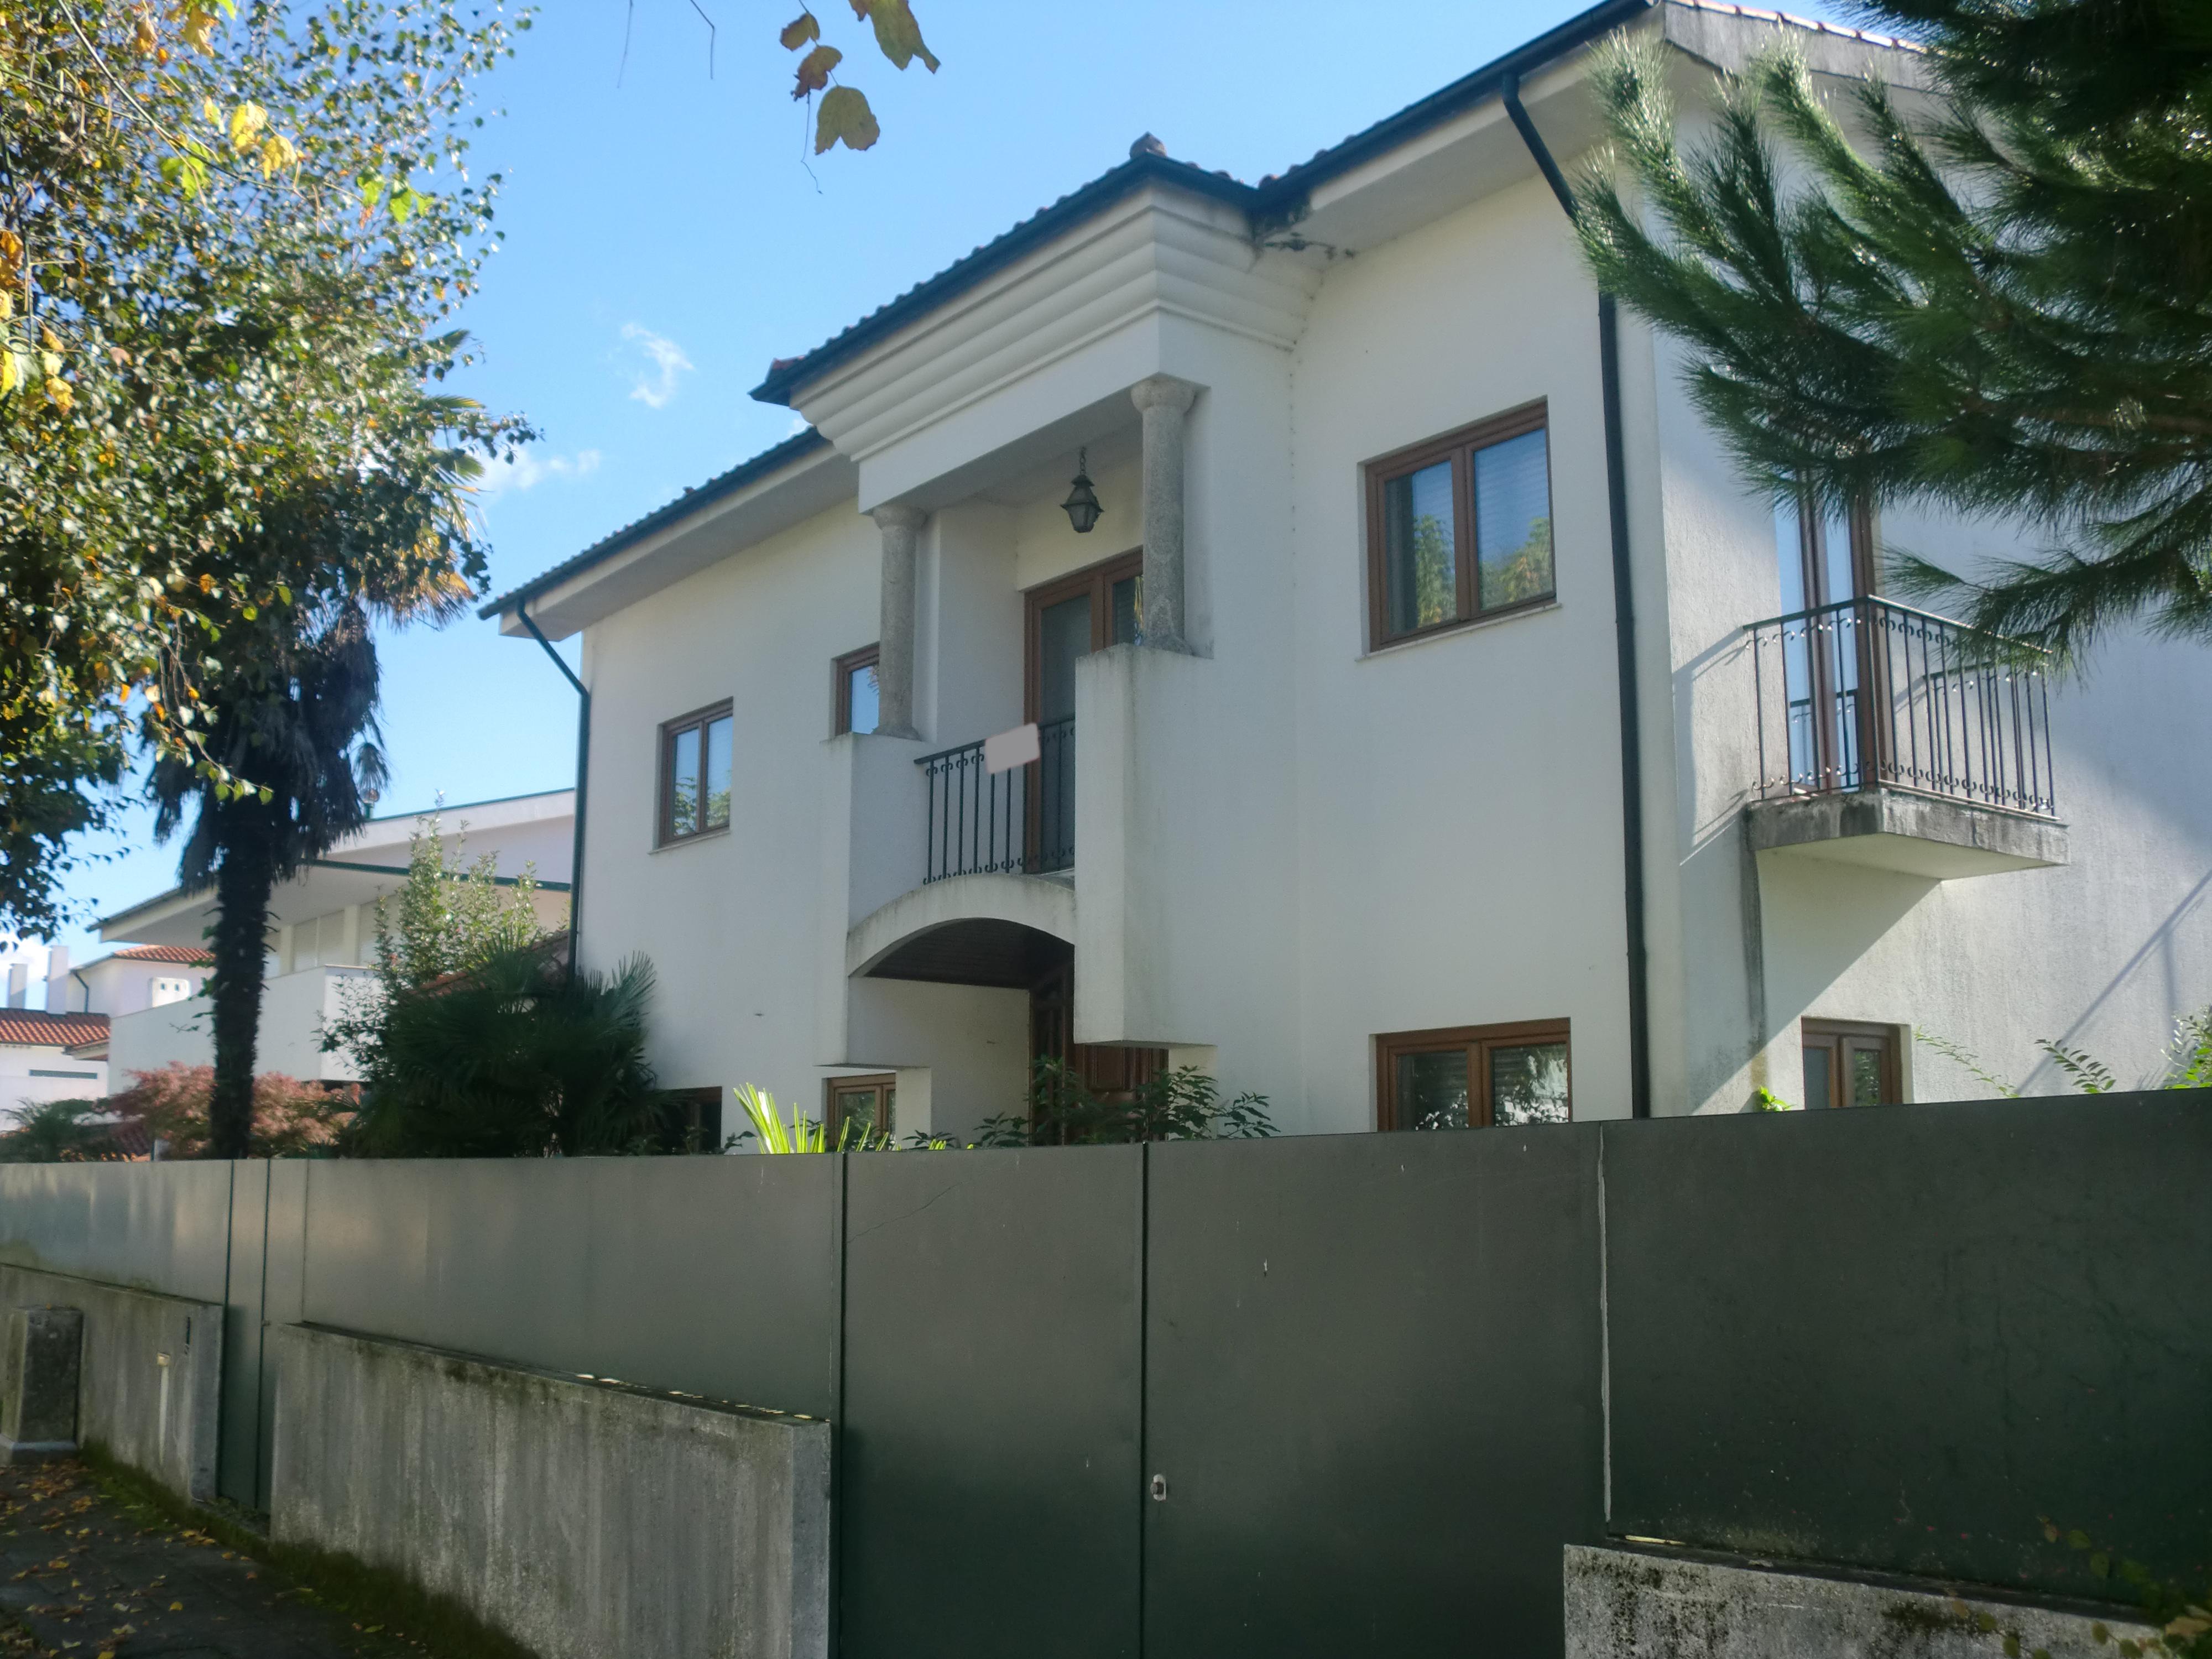 Moradia Isolada T4 Venda em Azurém,Guimarães